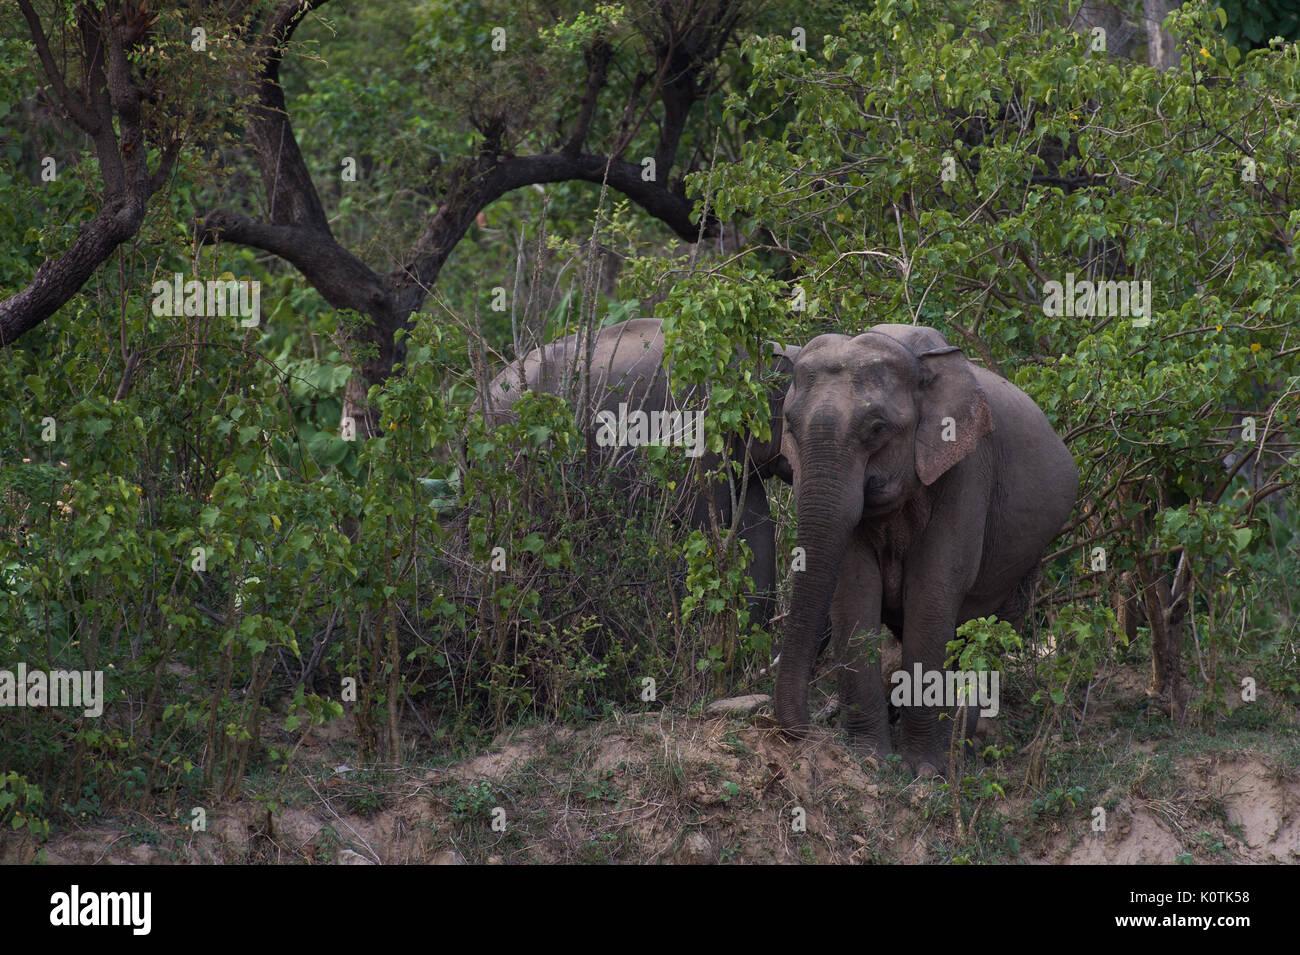 L'éléphant indien, Elephas maximus indicus, Elephantidae,Parc national de Rajaji, Inde Photo Stock